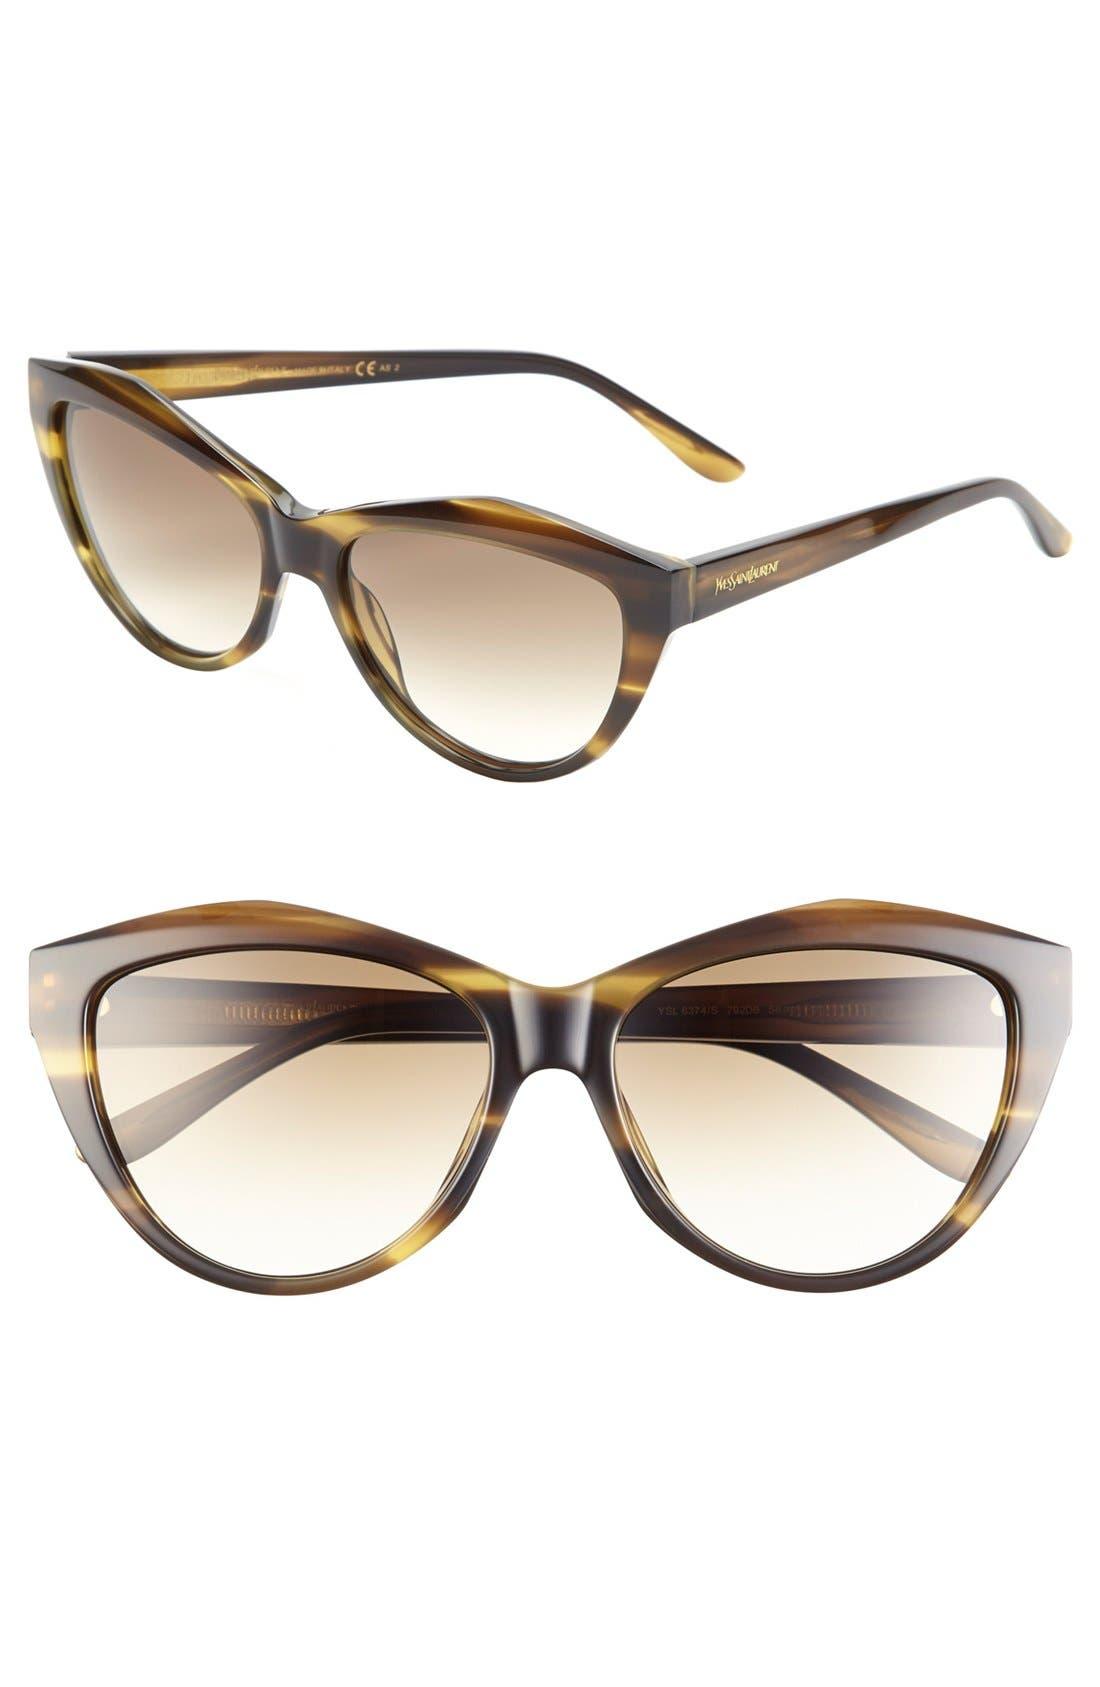 Alternate Image 1 Selected - Saint Laurent 56mm Cat Eye Sunglasses